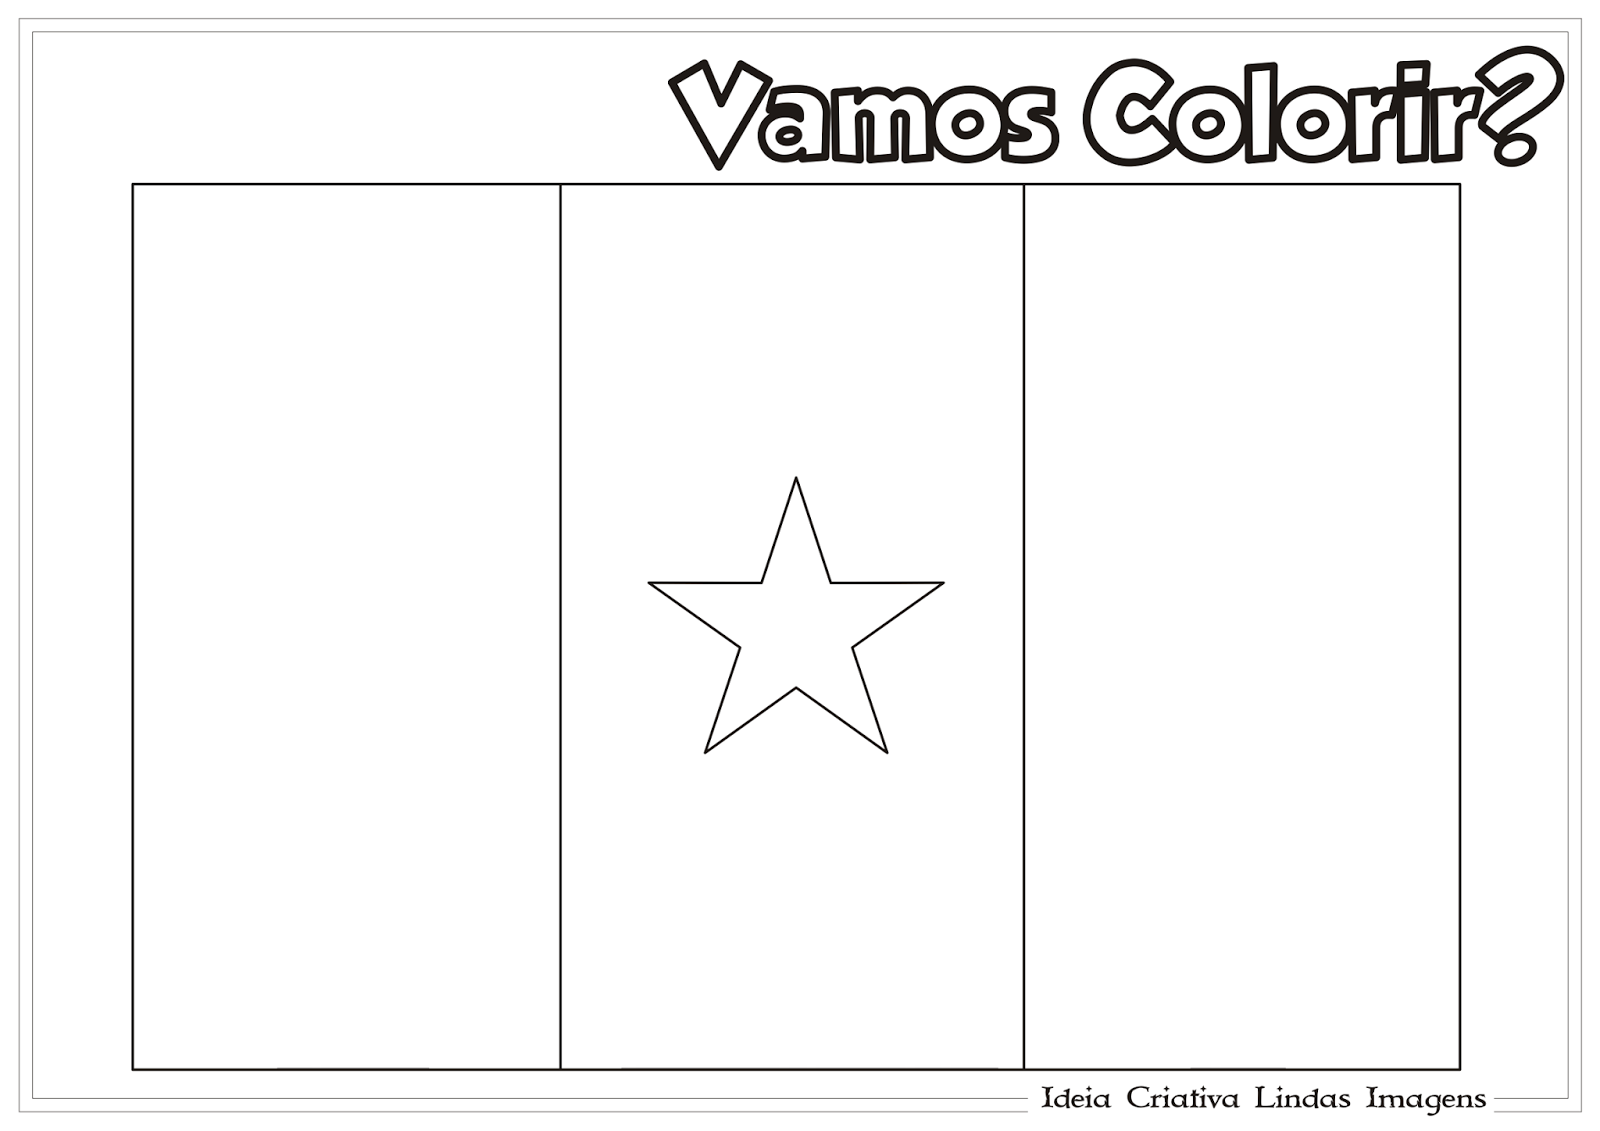 Copa do Mundo 2014 - Grupo A: Camarões bandeira para colorir